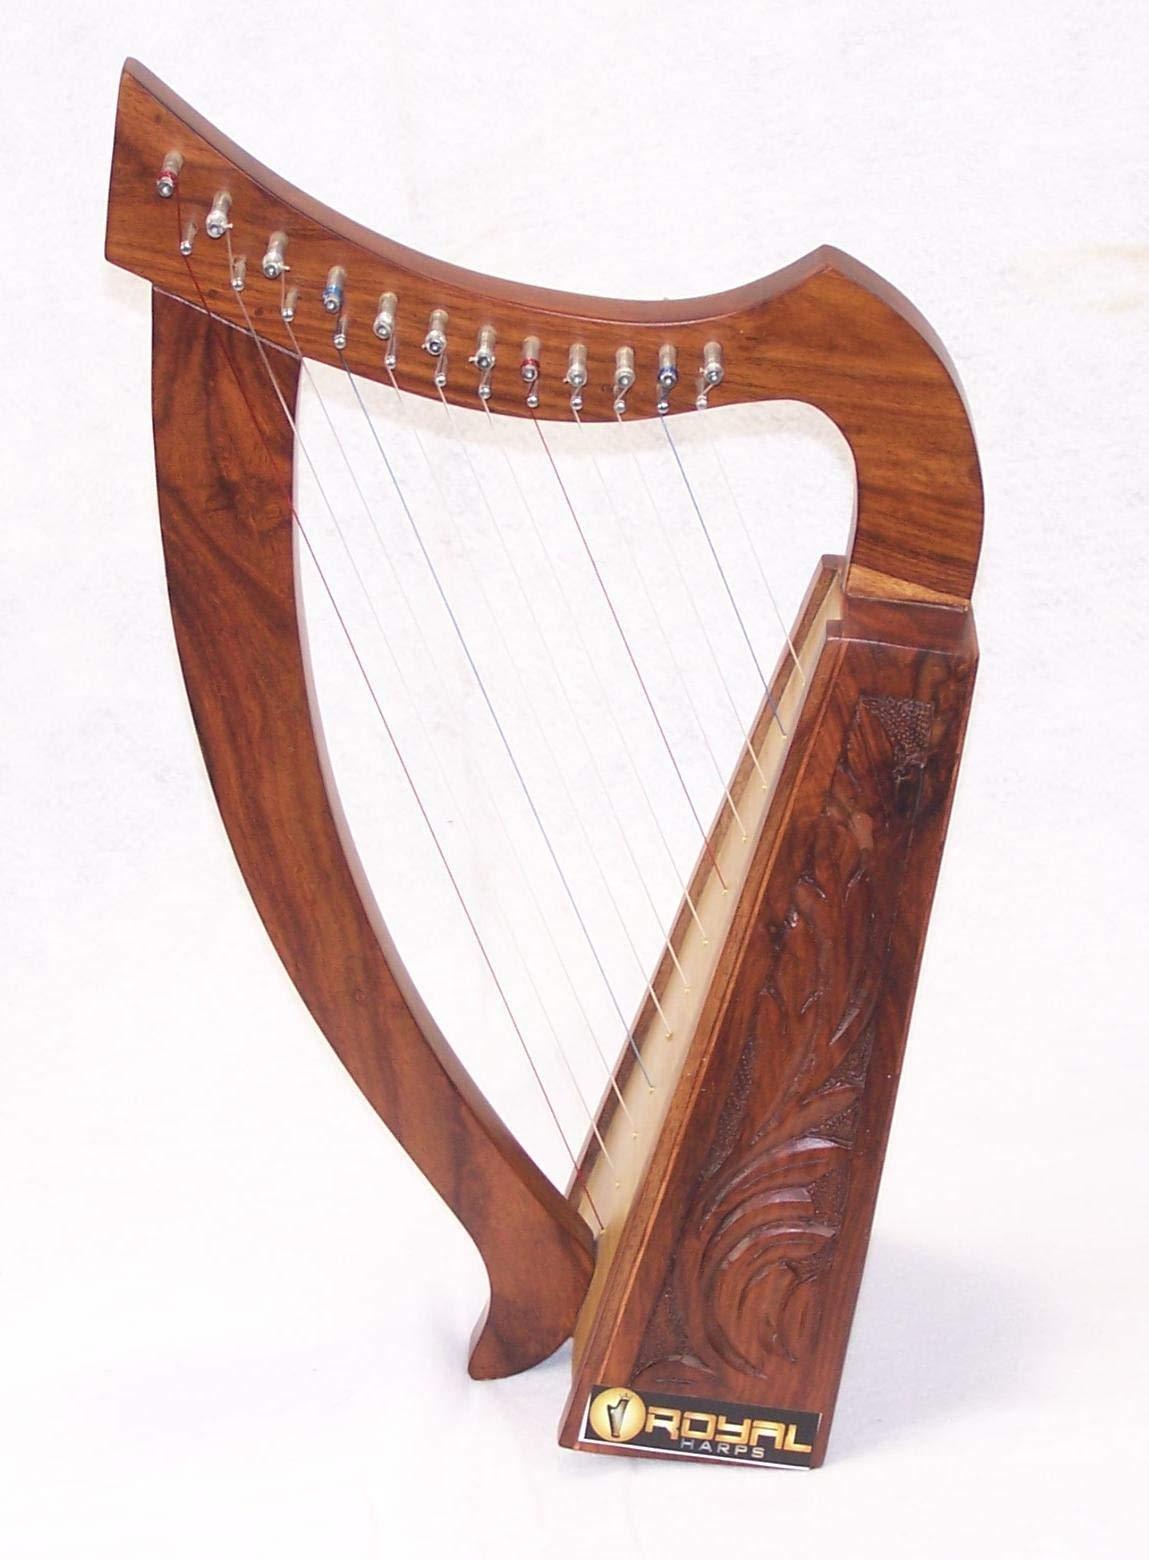 Celtic Irish Baby Harp 12 Strings Solid Wood Free Bag Strings Key by ROYAL HARPS (Image #6)